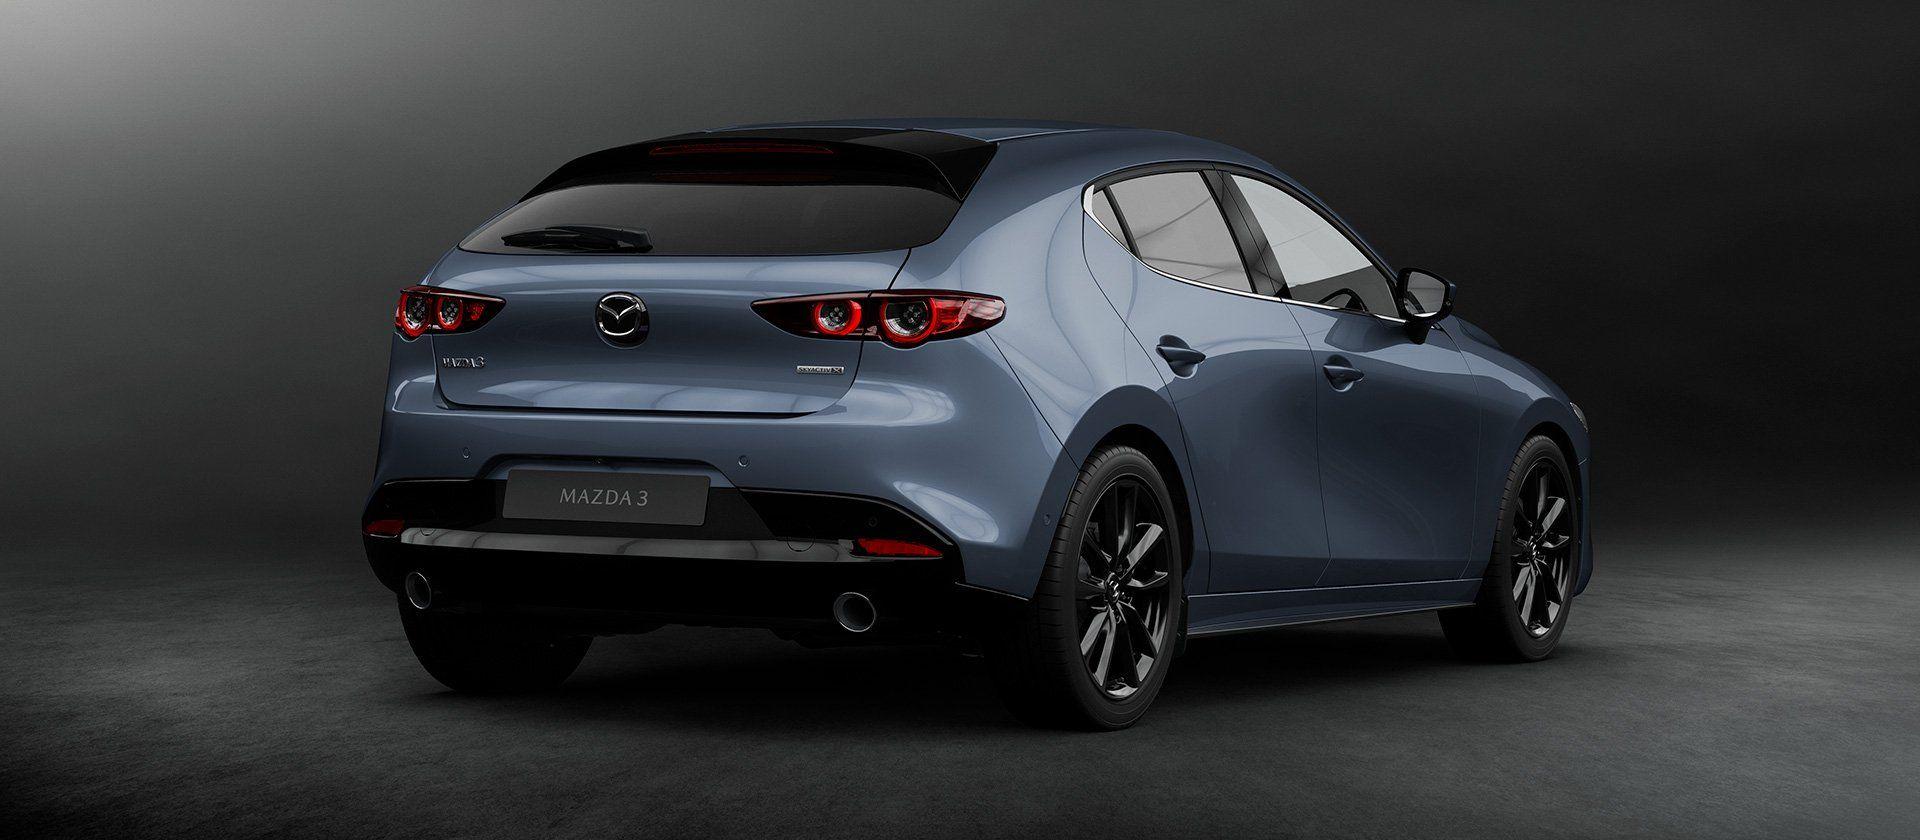 Mazda3 til sölu 5 dyra Mazda á Íslandi Coches